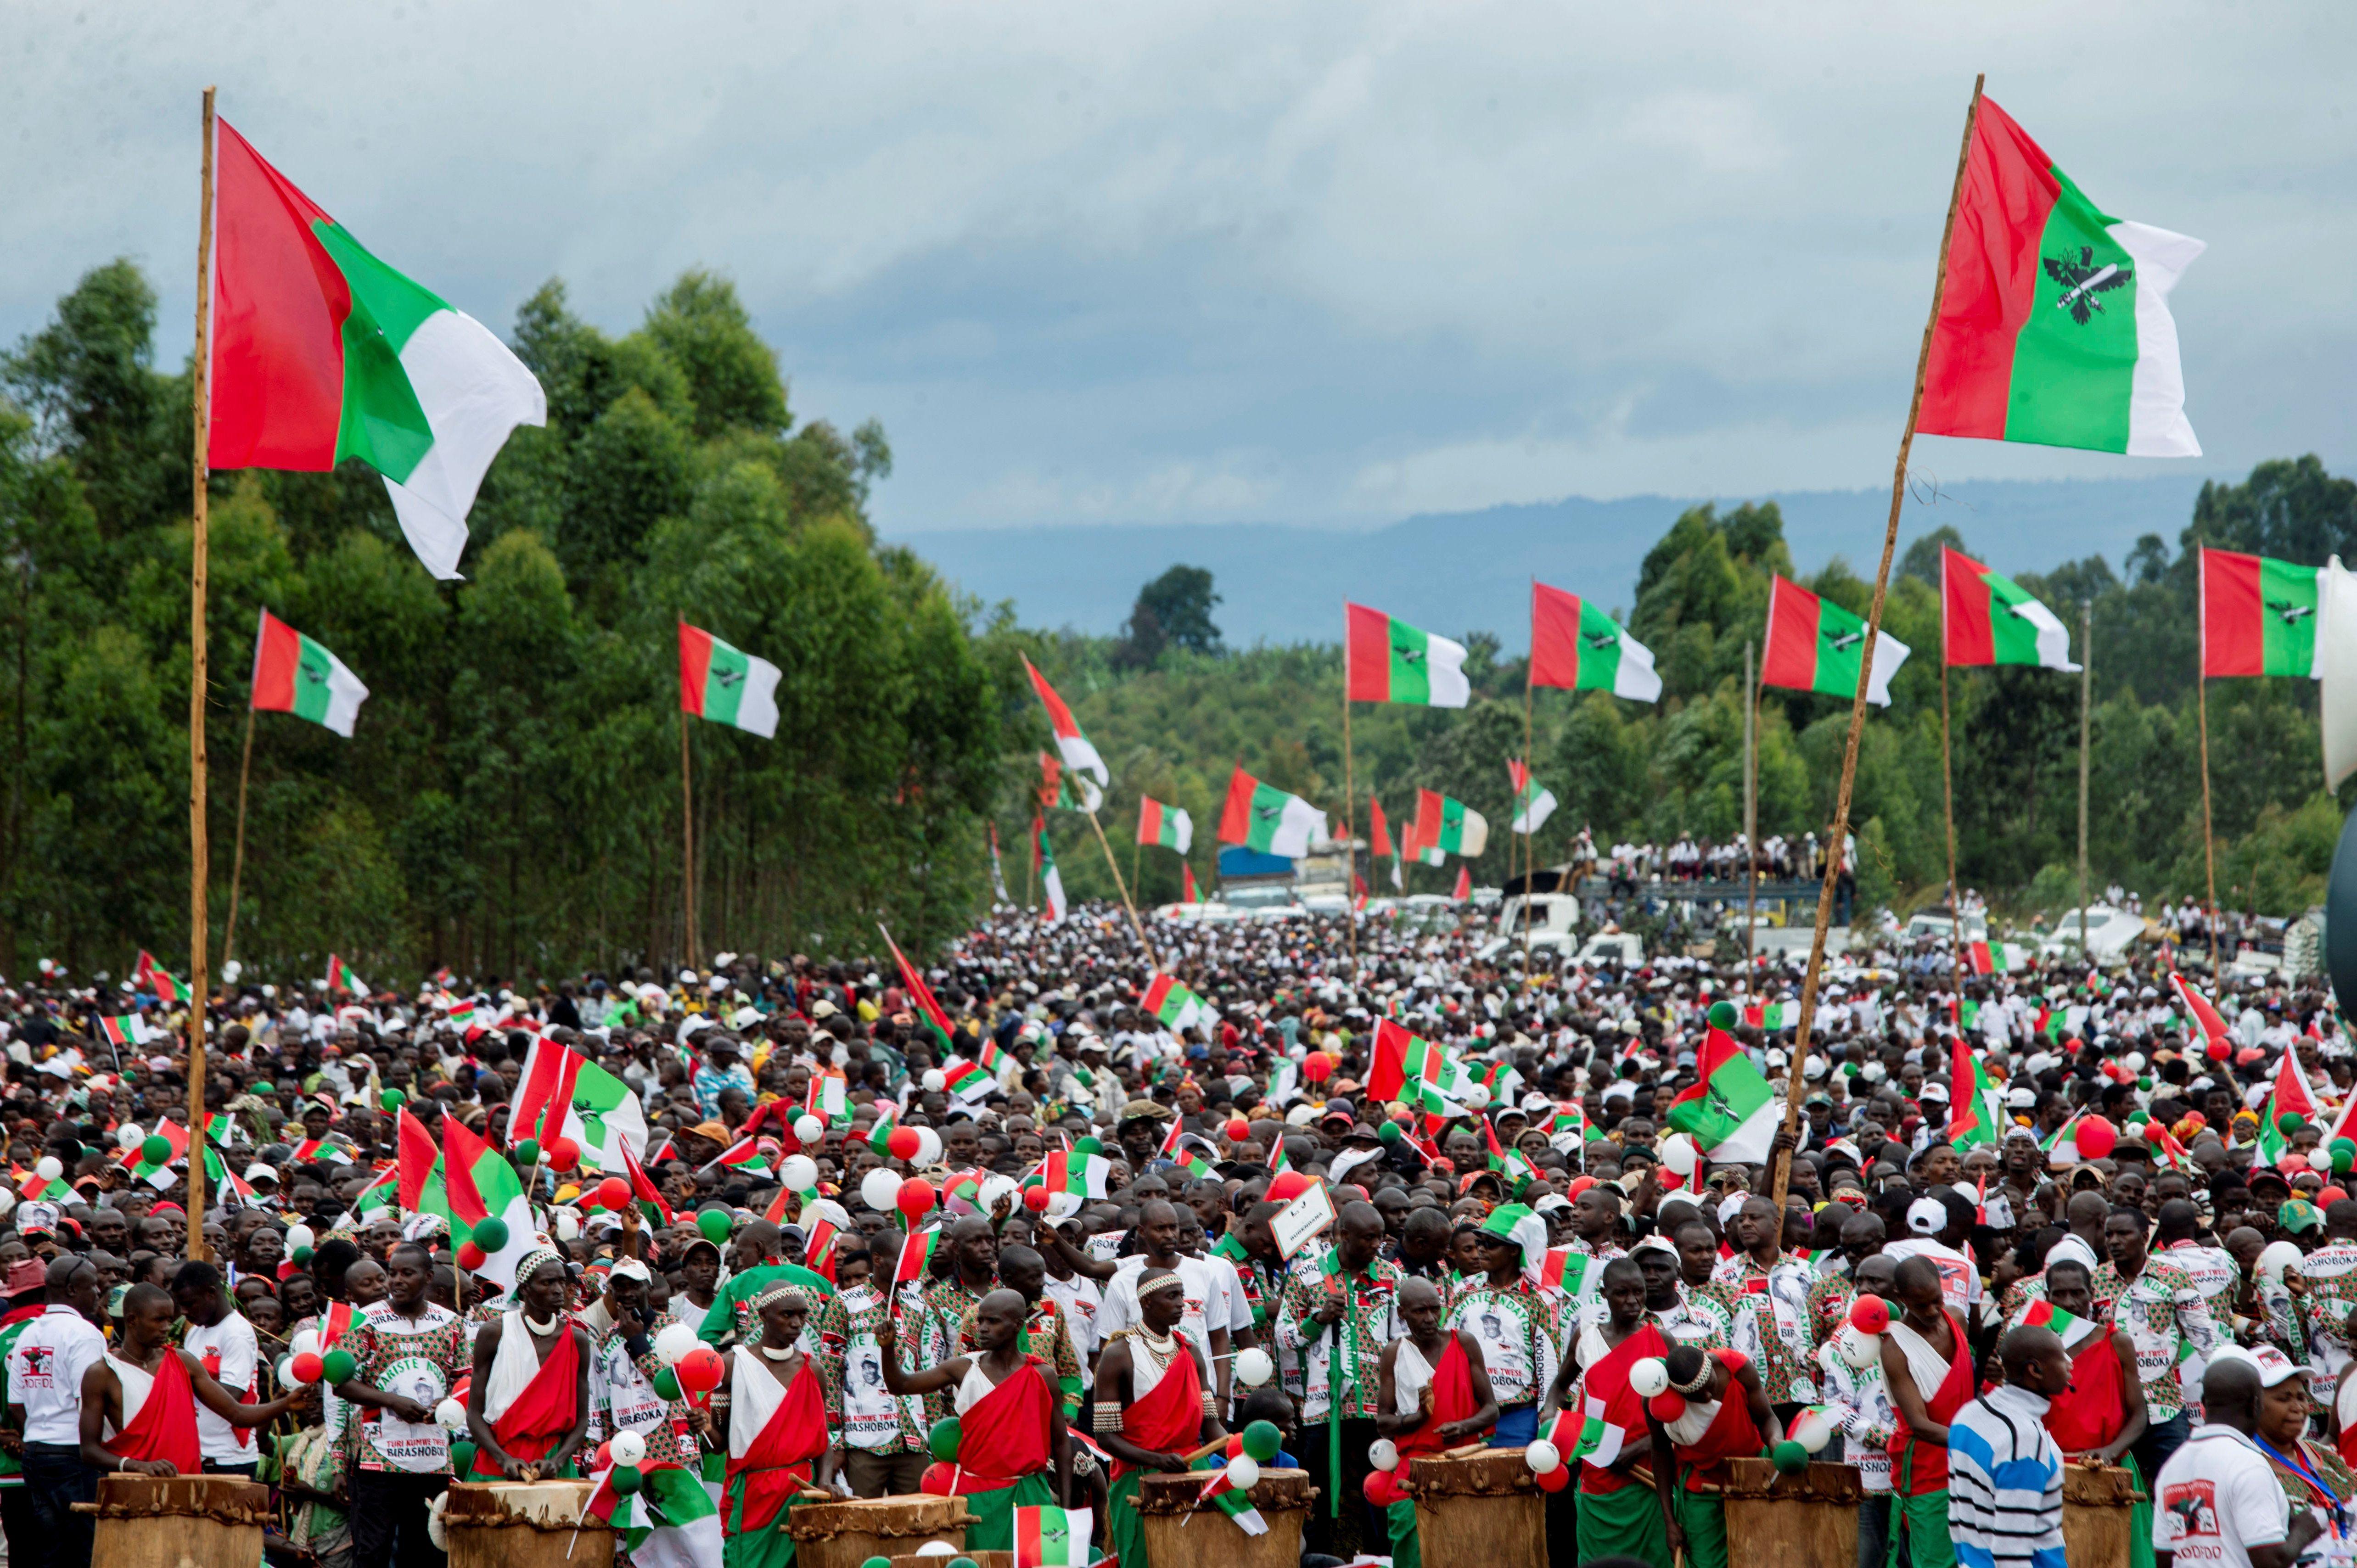 Coronavirus Politics Daily: Burundi boots the WHO, vaccine squabbles, Haiti braces for an outbreak